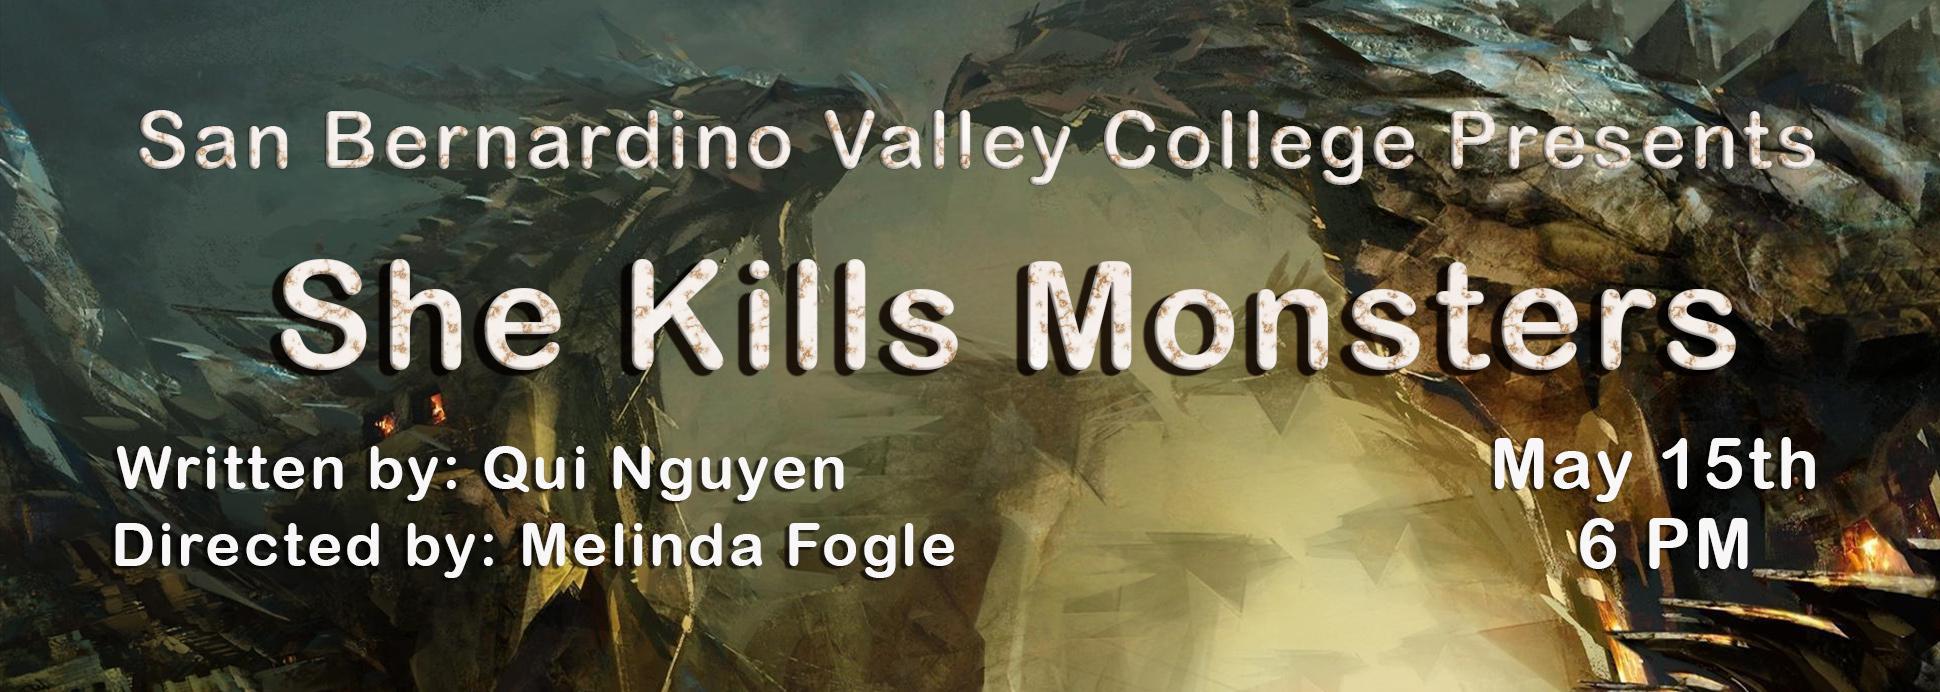 She Kills Monsters May 15th 6:00 PM